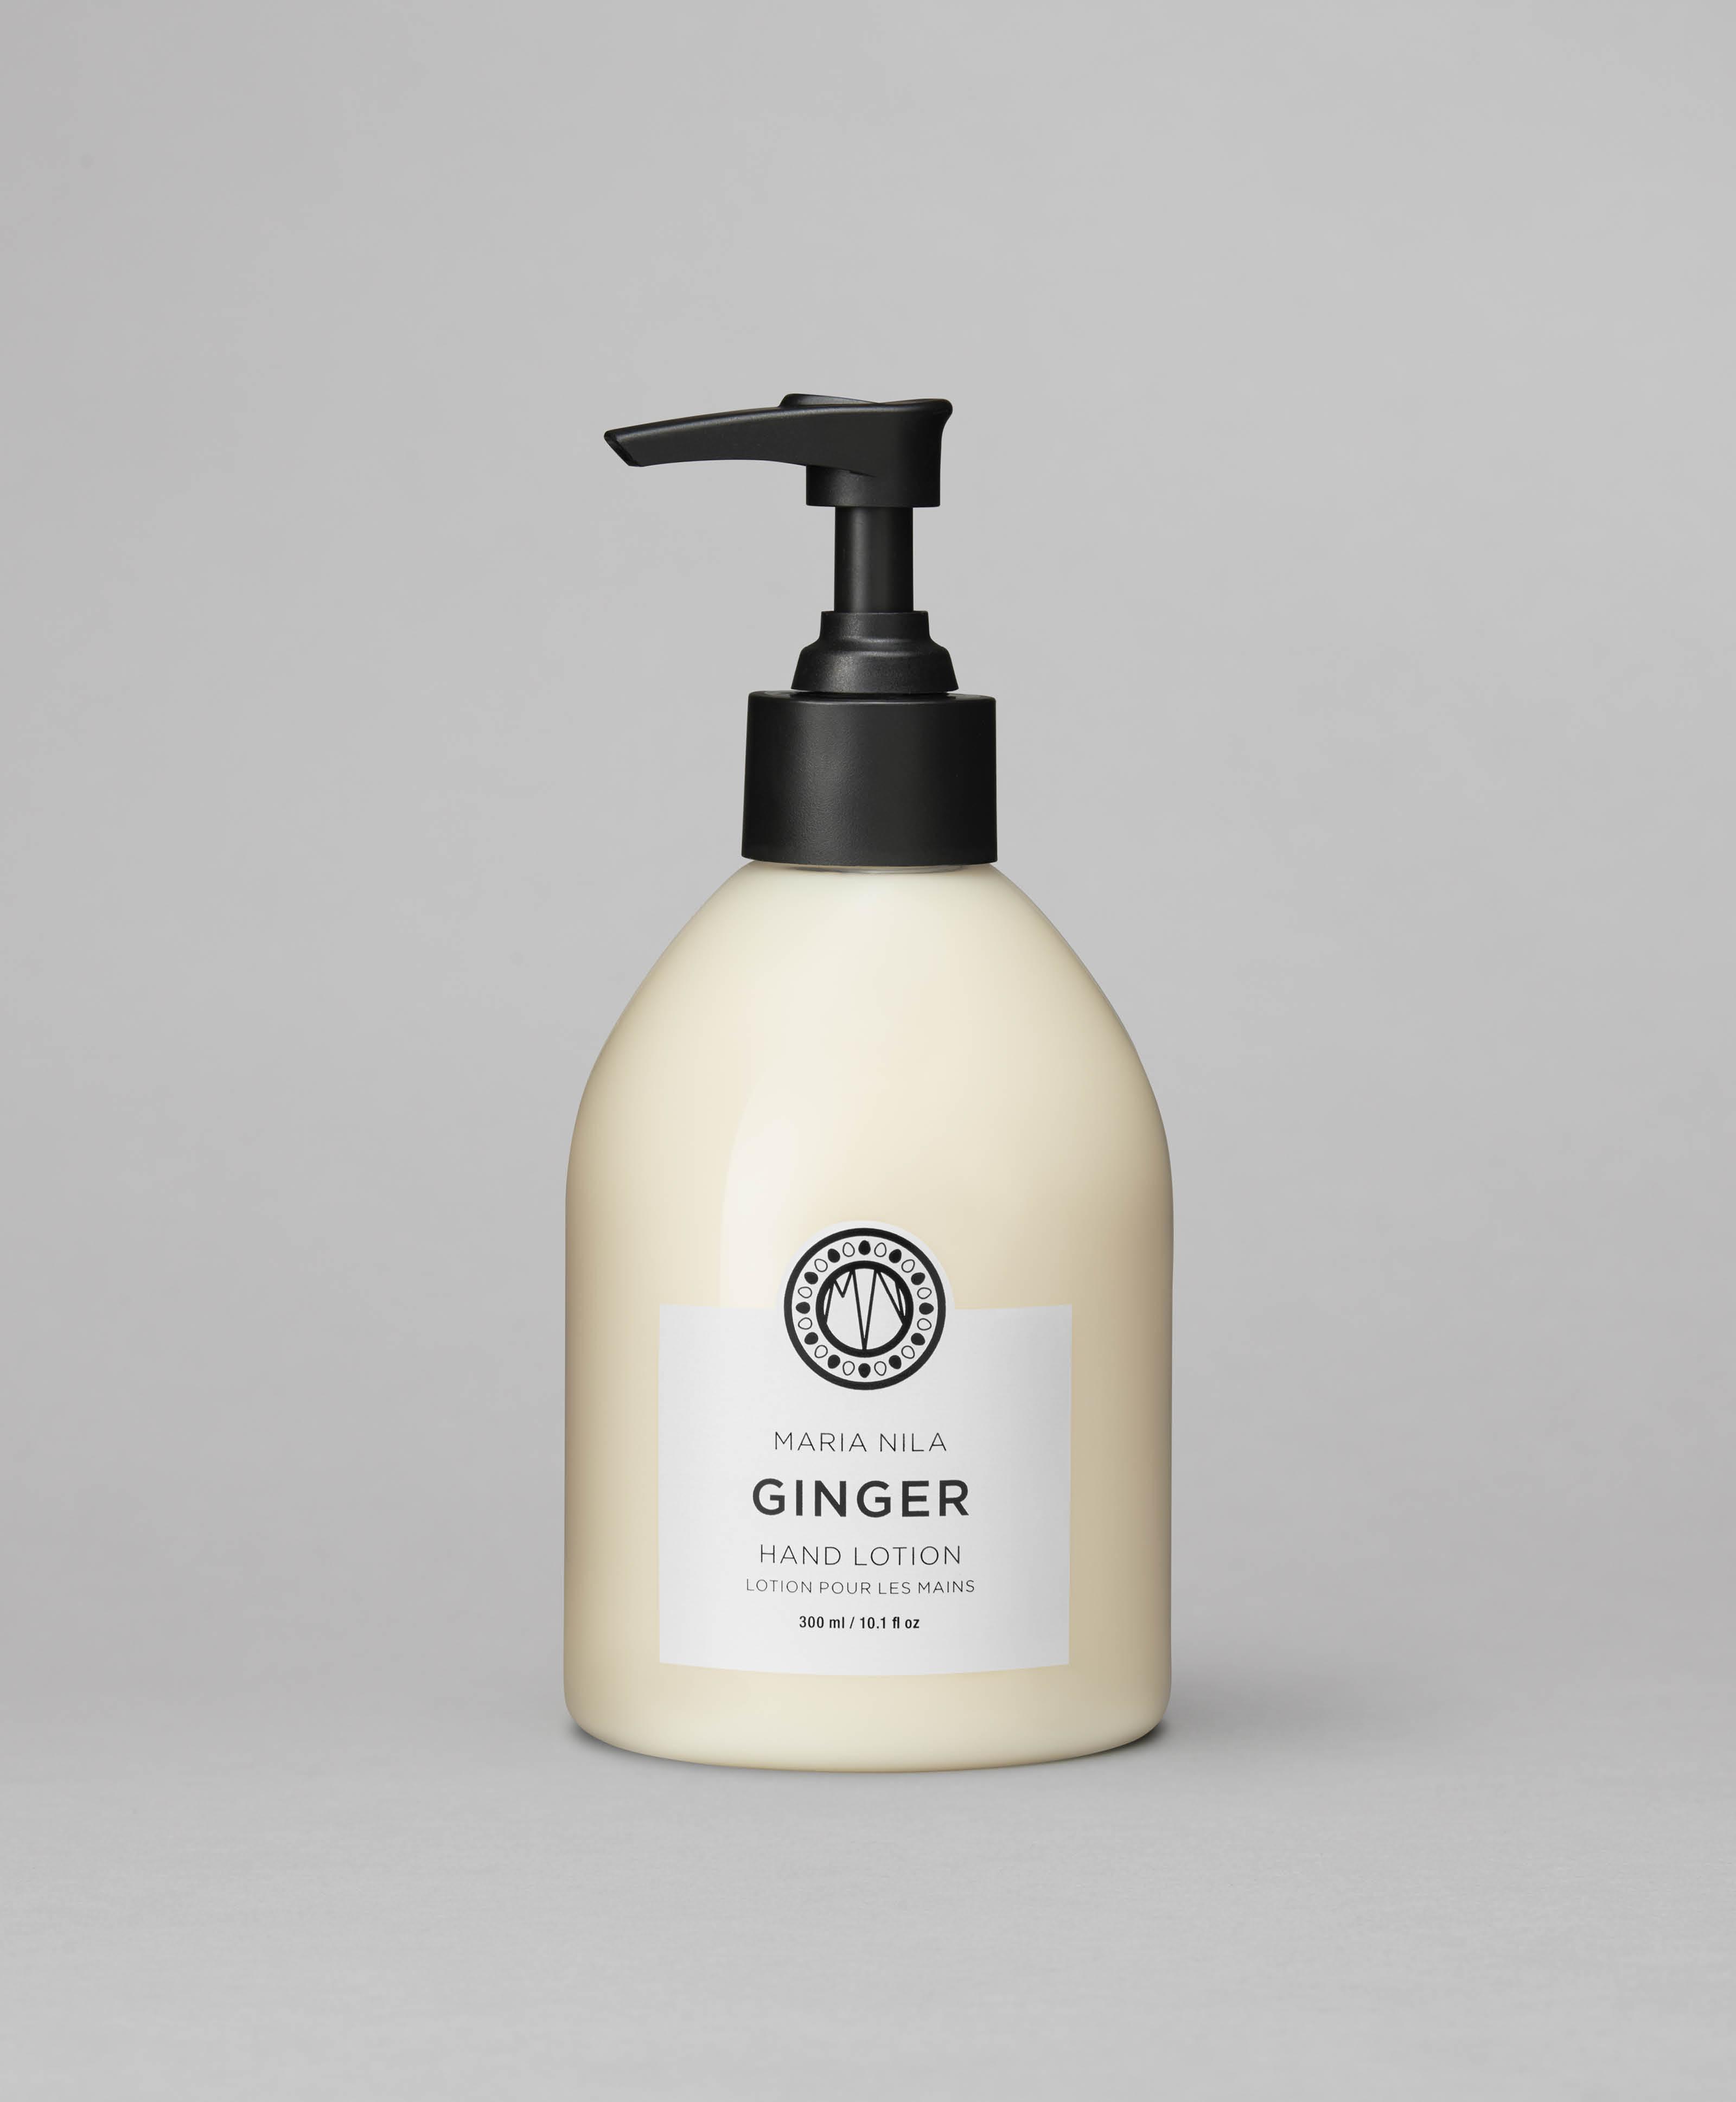 Maria Nila Ginger Hand Lotion 300 ml